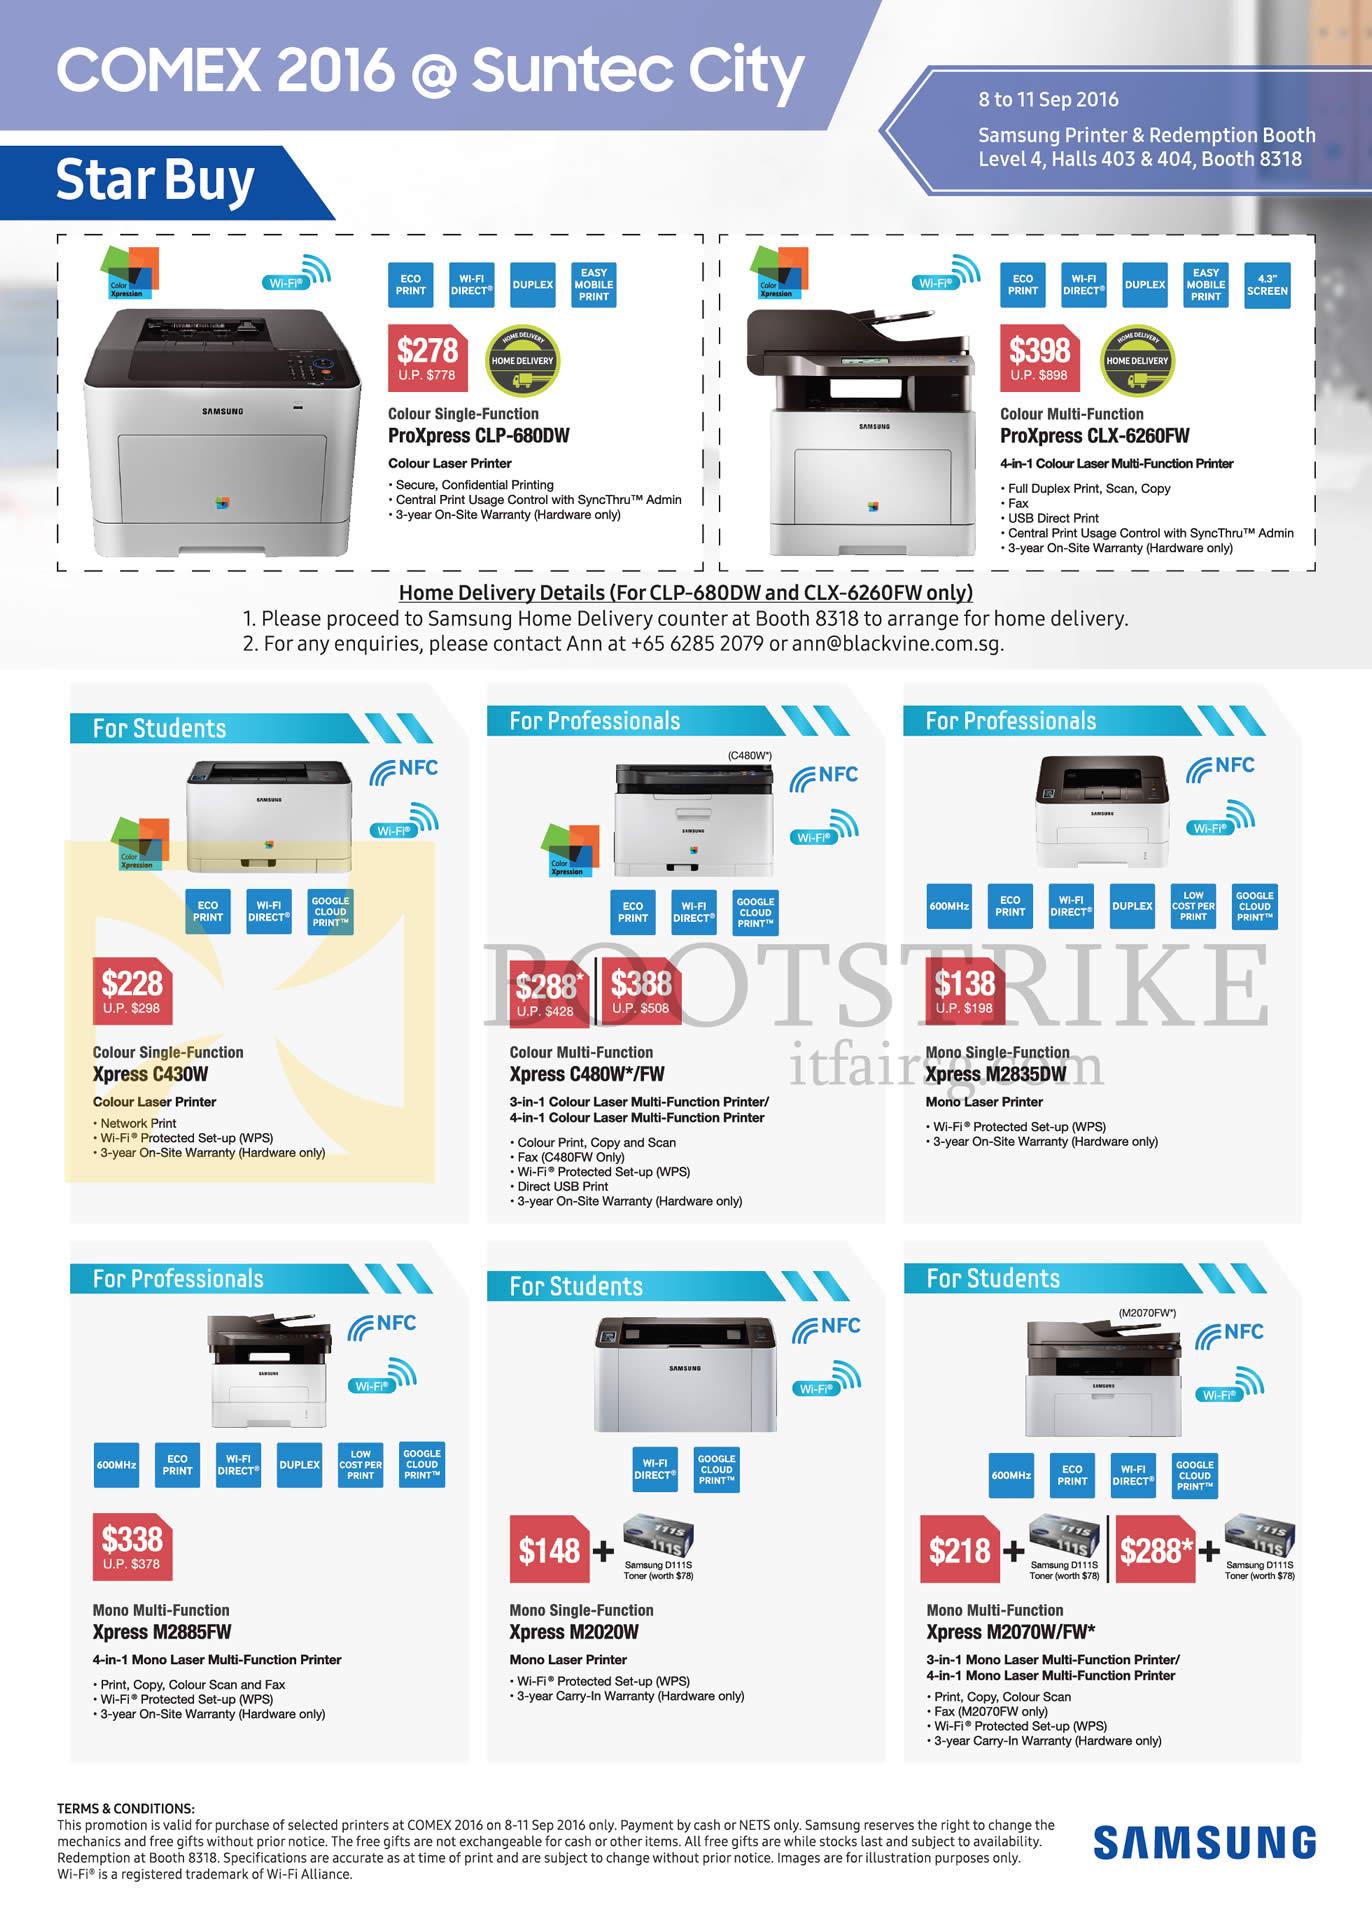 COMEX 2016 price list image brochure of Samsung Printers Laser ProXpress CLP-680DW, CLX-6260FW, Xpress C430W, C480W, M2835DW, M2885FW, M2020W, M2070W, FW